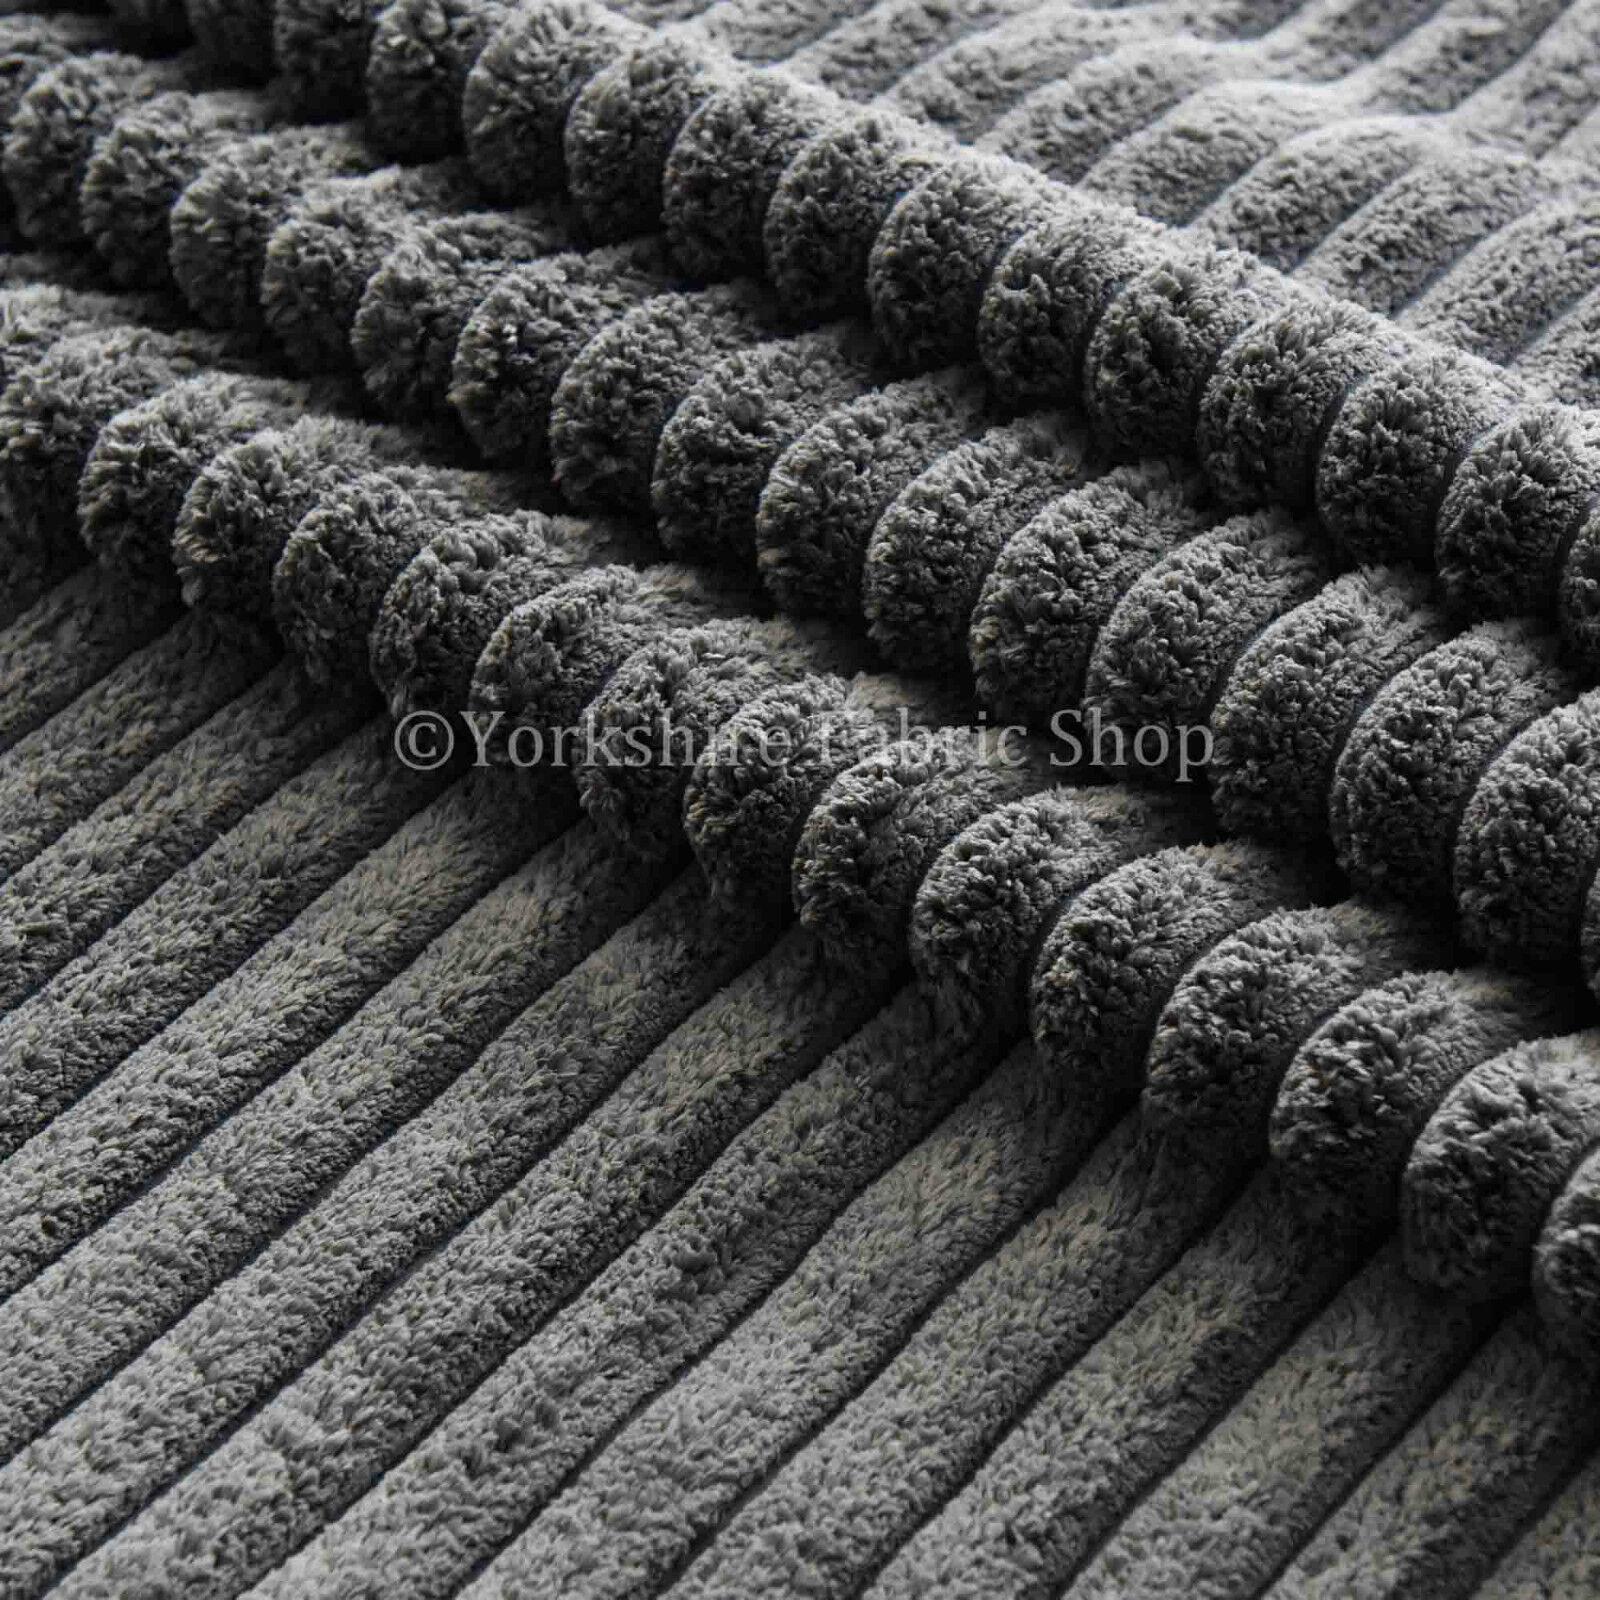 grey leather sofas harveys square shaped soft chunky super jumbo corduroy upholstery curtains ...